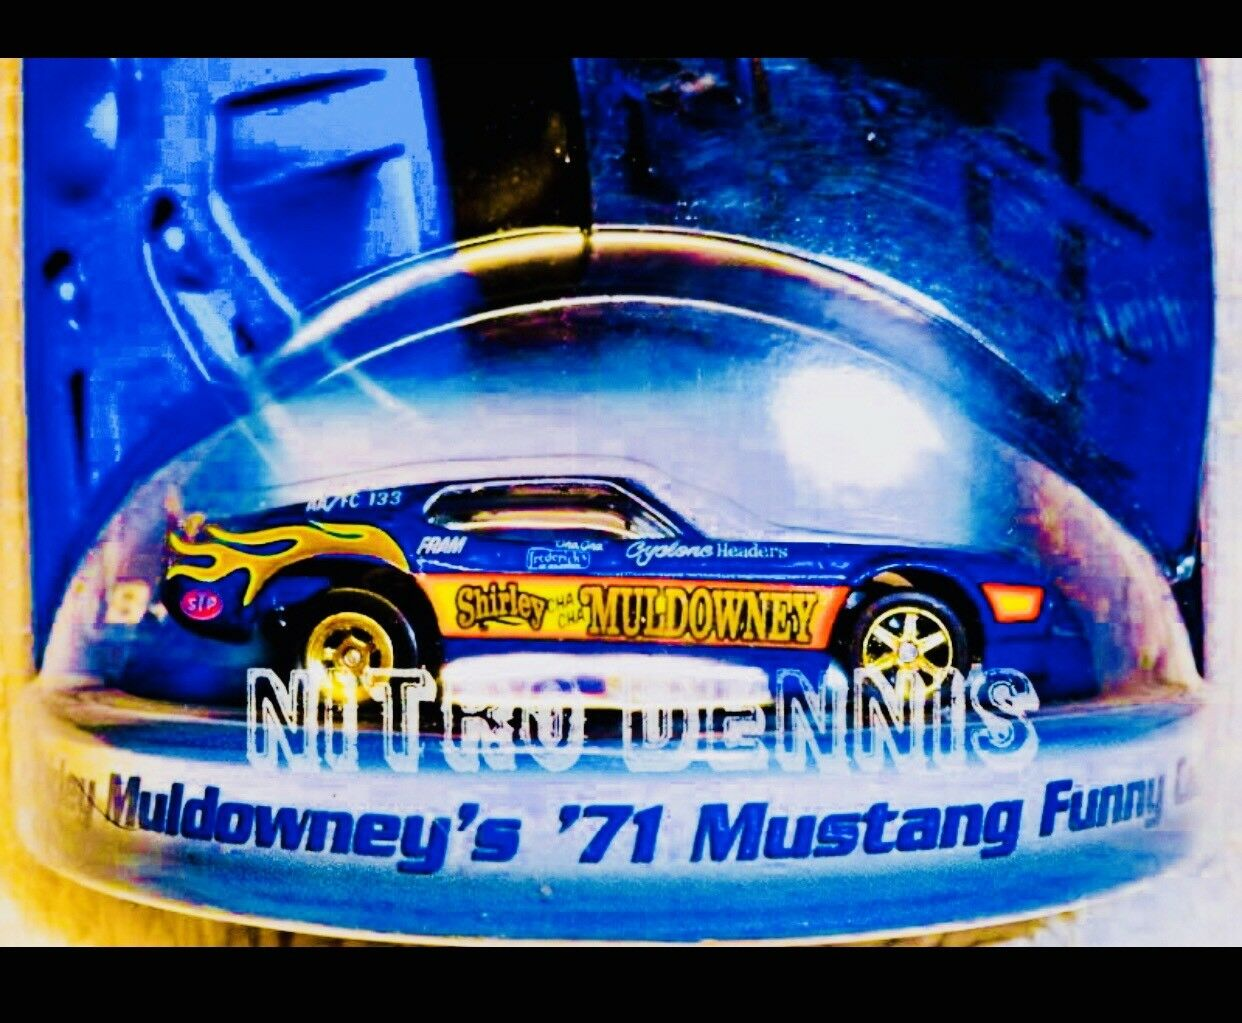 NHRA Shirley Muldowney 1 64 Top Fuel Nitro Coche Diverdeido IHRA Drag Racing Adra